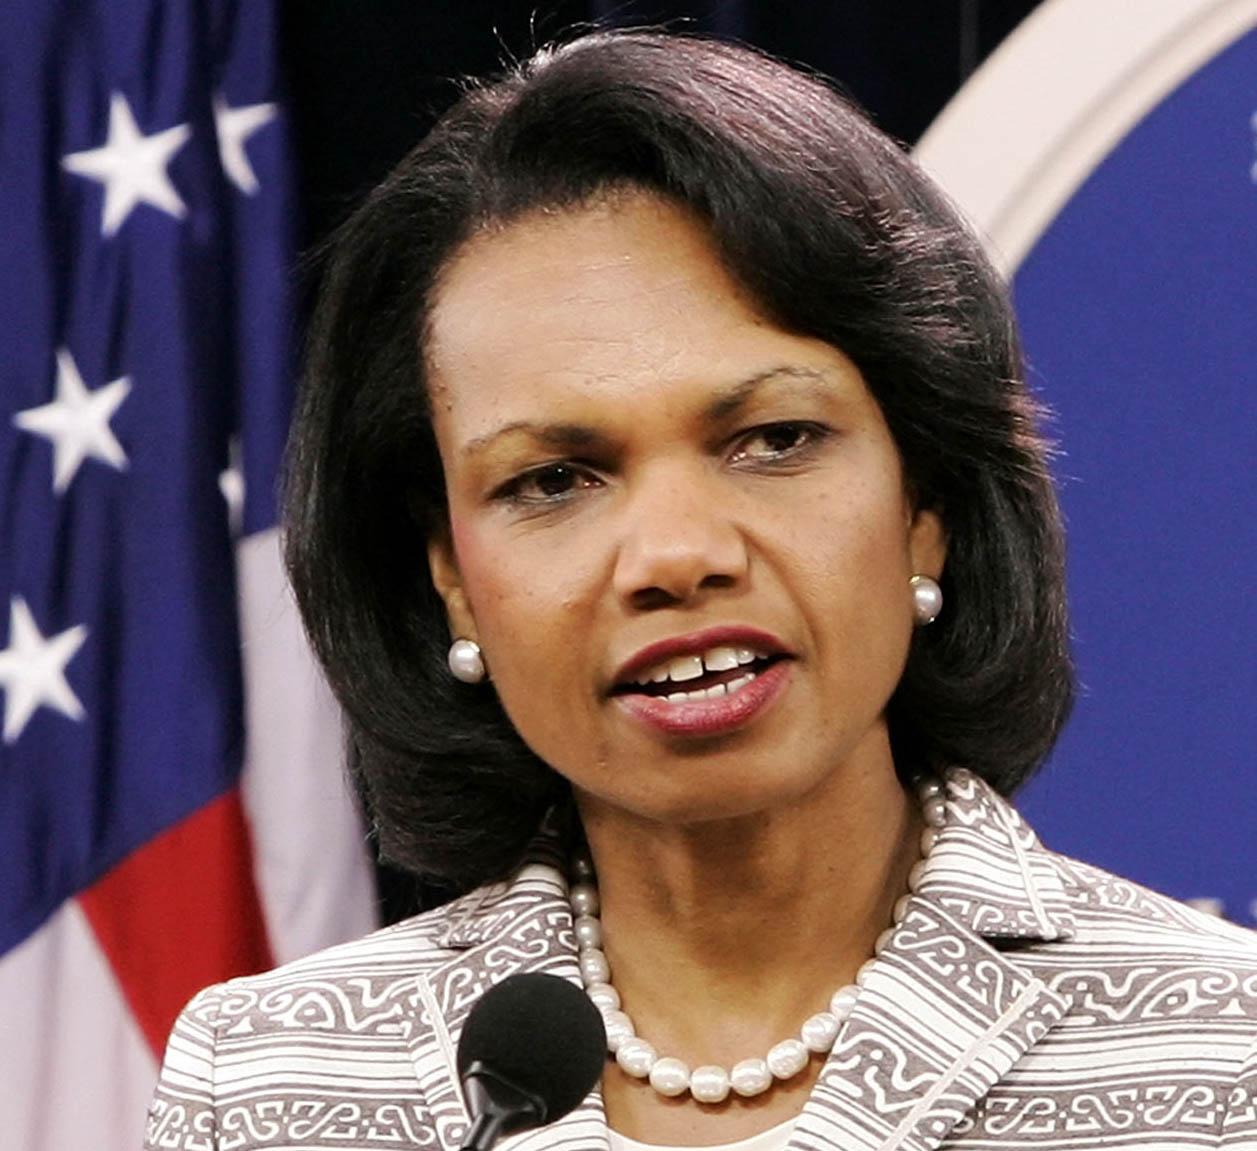 Condoleezza Rice Net Worth